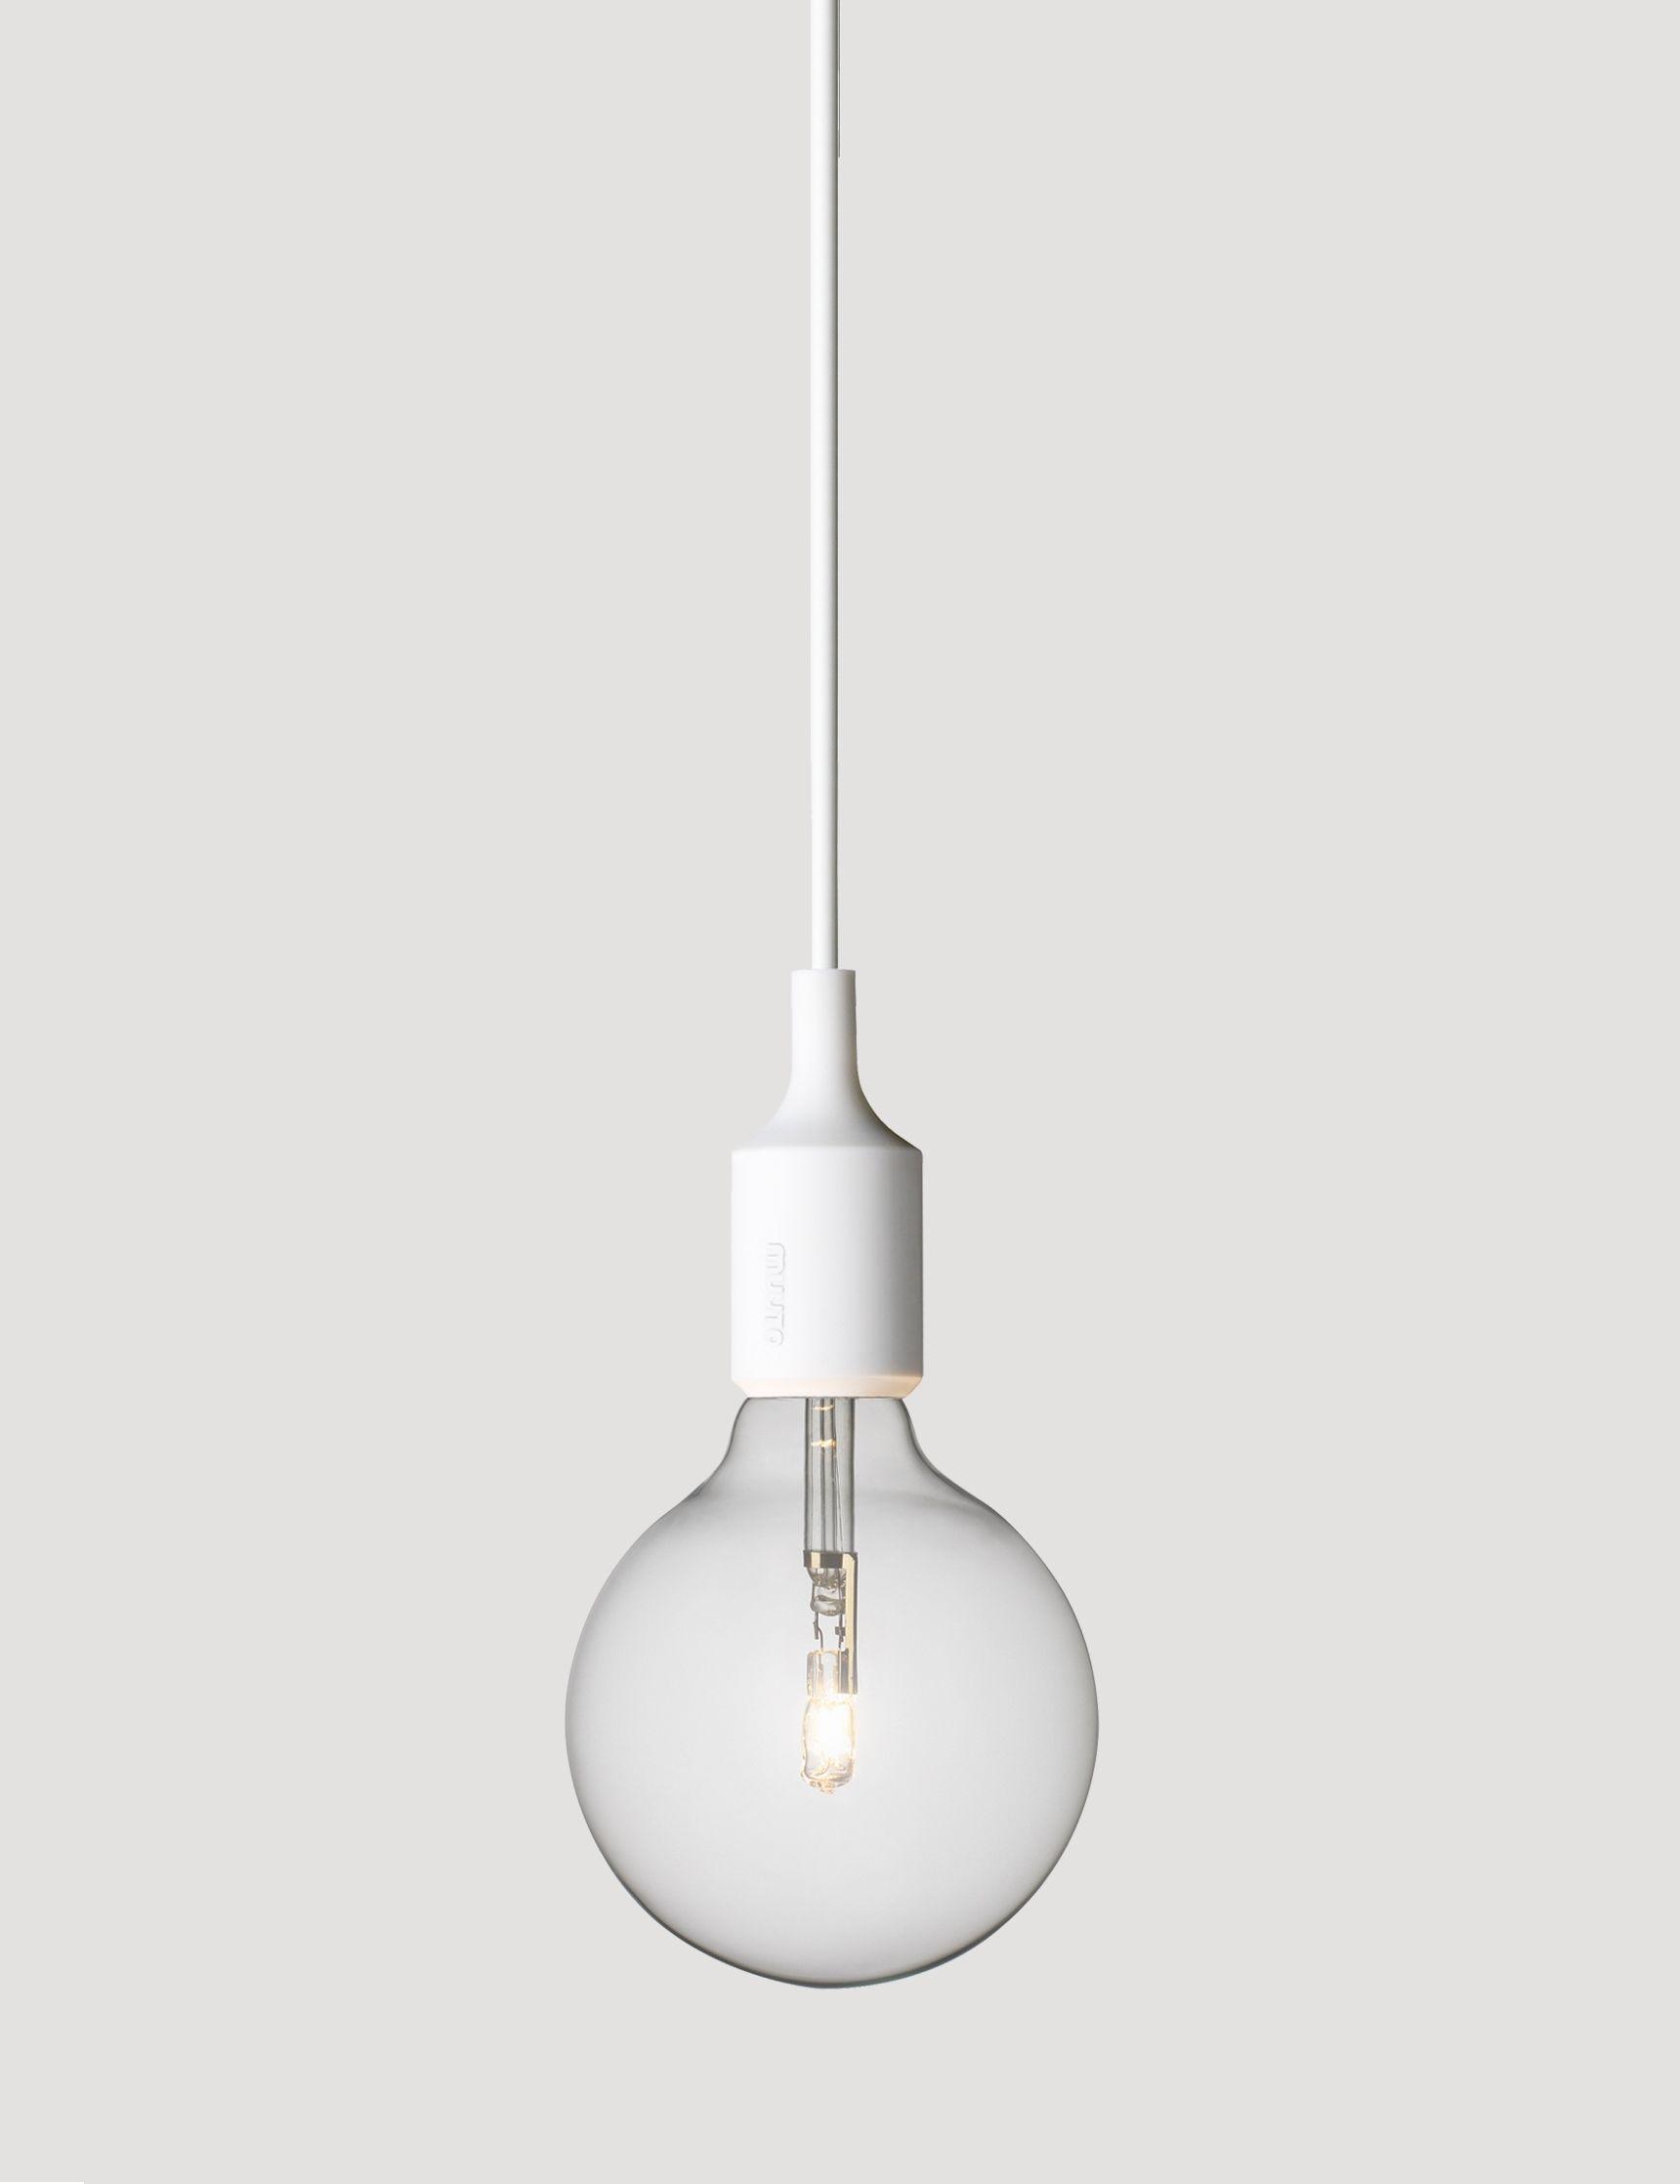 Pin By Muuto On Muuto Lighting Pendant Lamp Lamp Modern Scandinavian Design